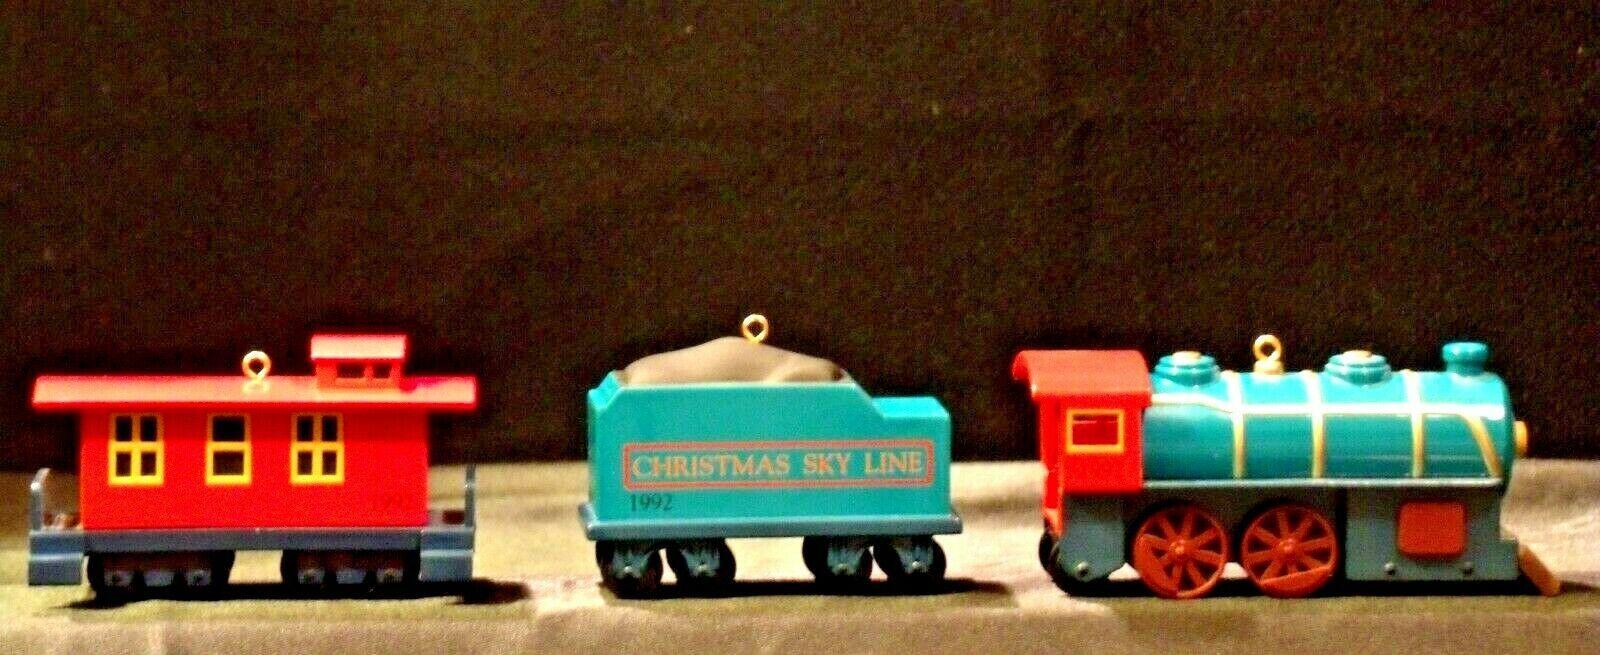 Hallmark Keepsake Ornament Christmas Skyline Train Collection AA-191770 Vintage